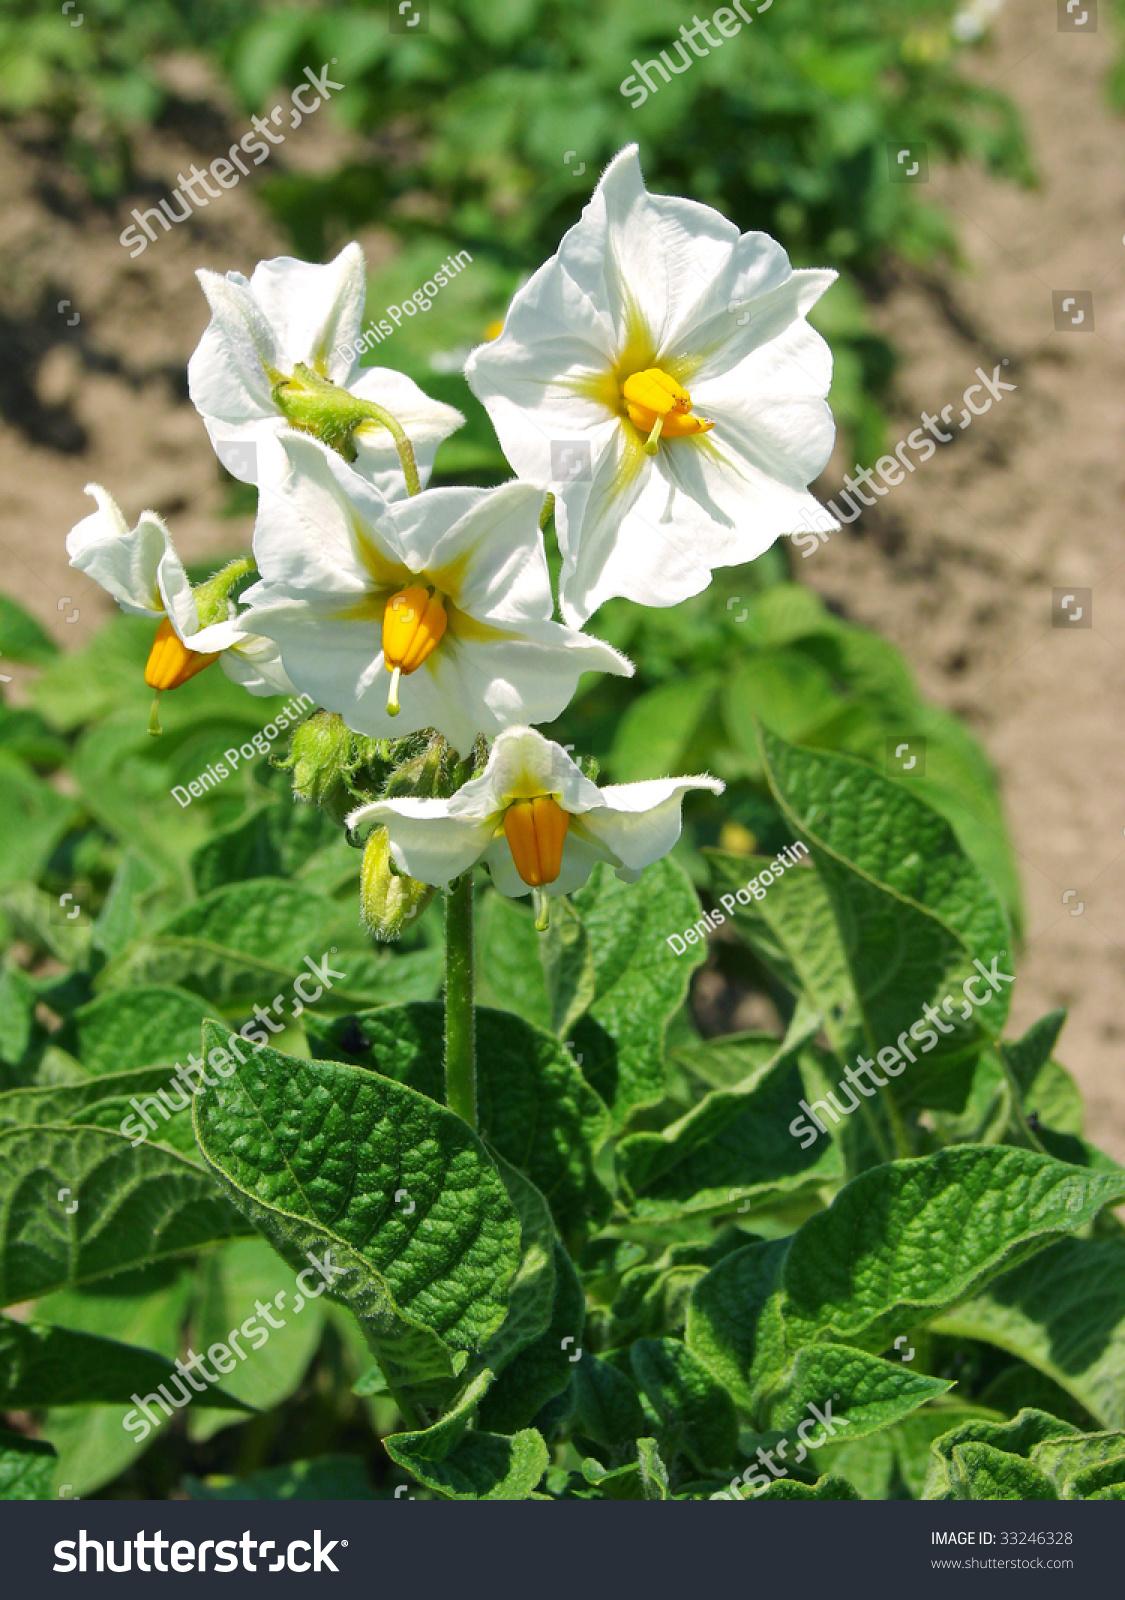 Potato plant white flowers on vegetable stock photo 100 legal potato plant with white flowers on the vegetable bed mightylinksfo